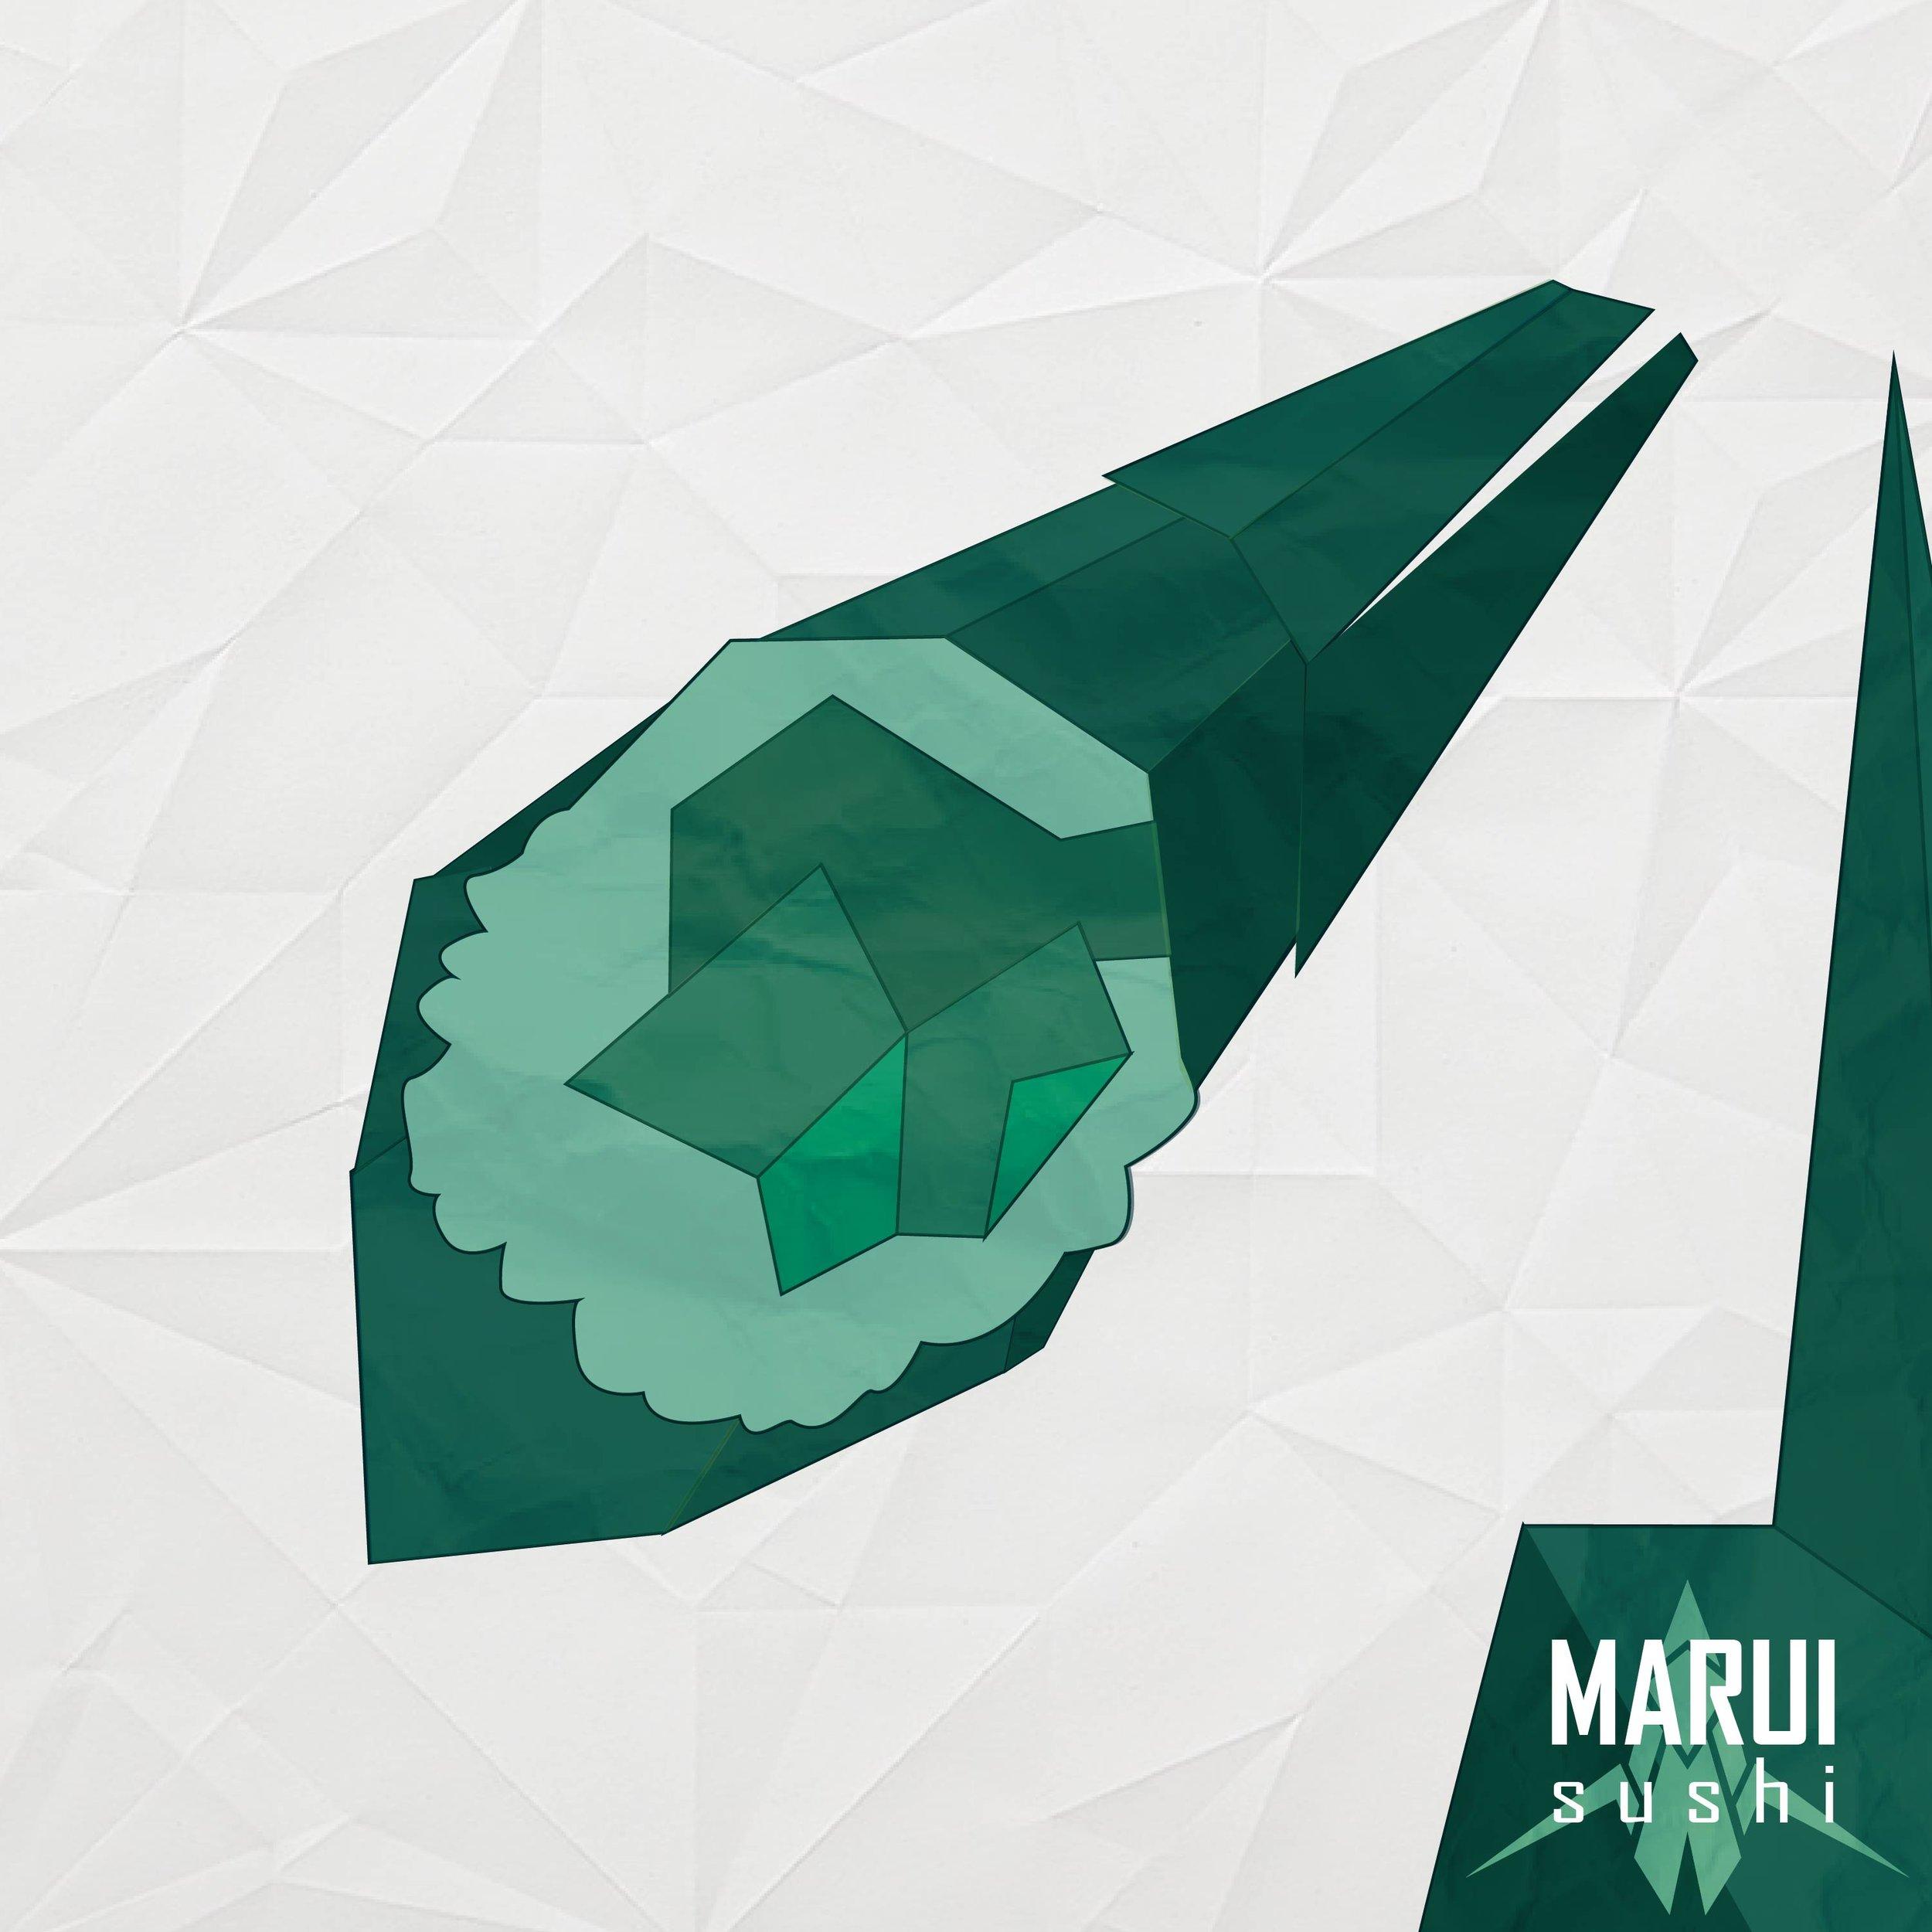 Marui Sushi Instagram Ads 4/6